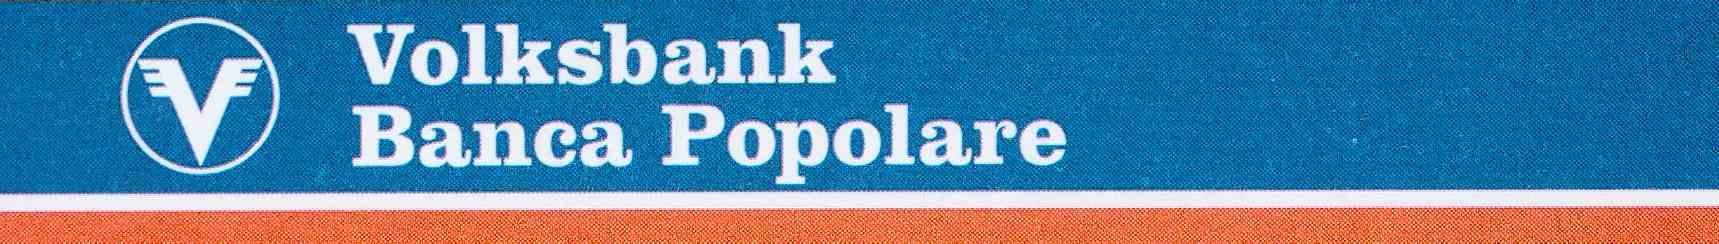 Volksbank Logo - VOLKSBANK SENIOR DAY  (13:00 - 14:00)